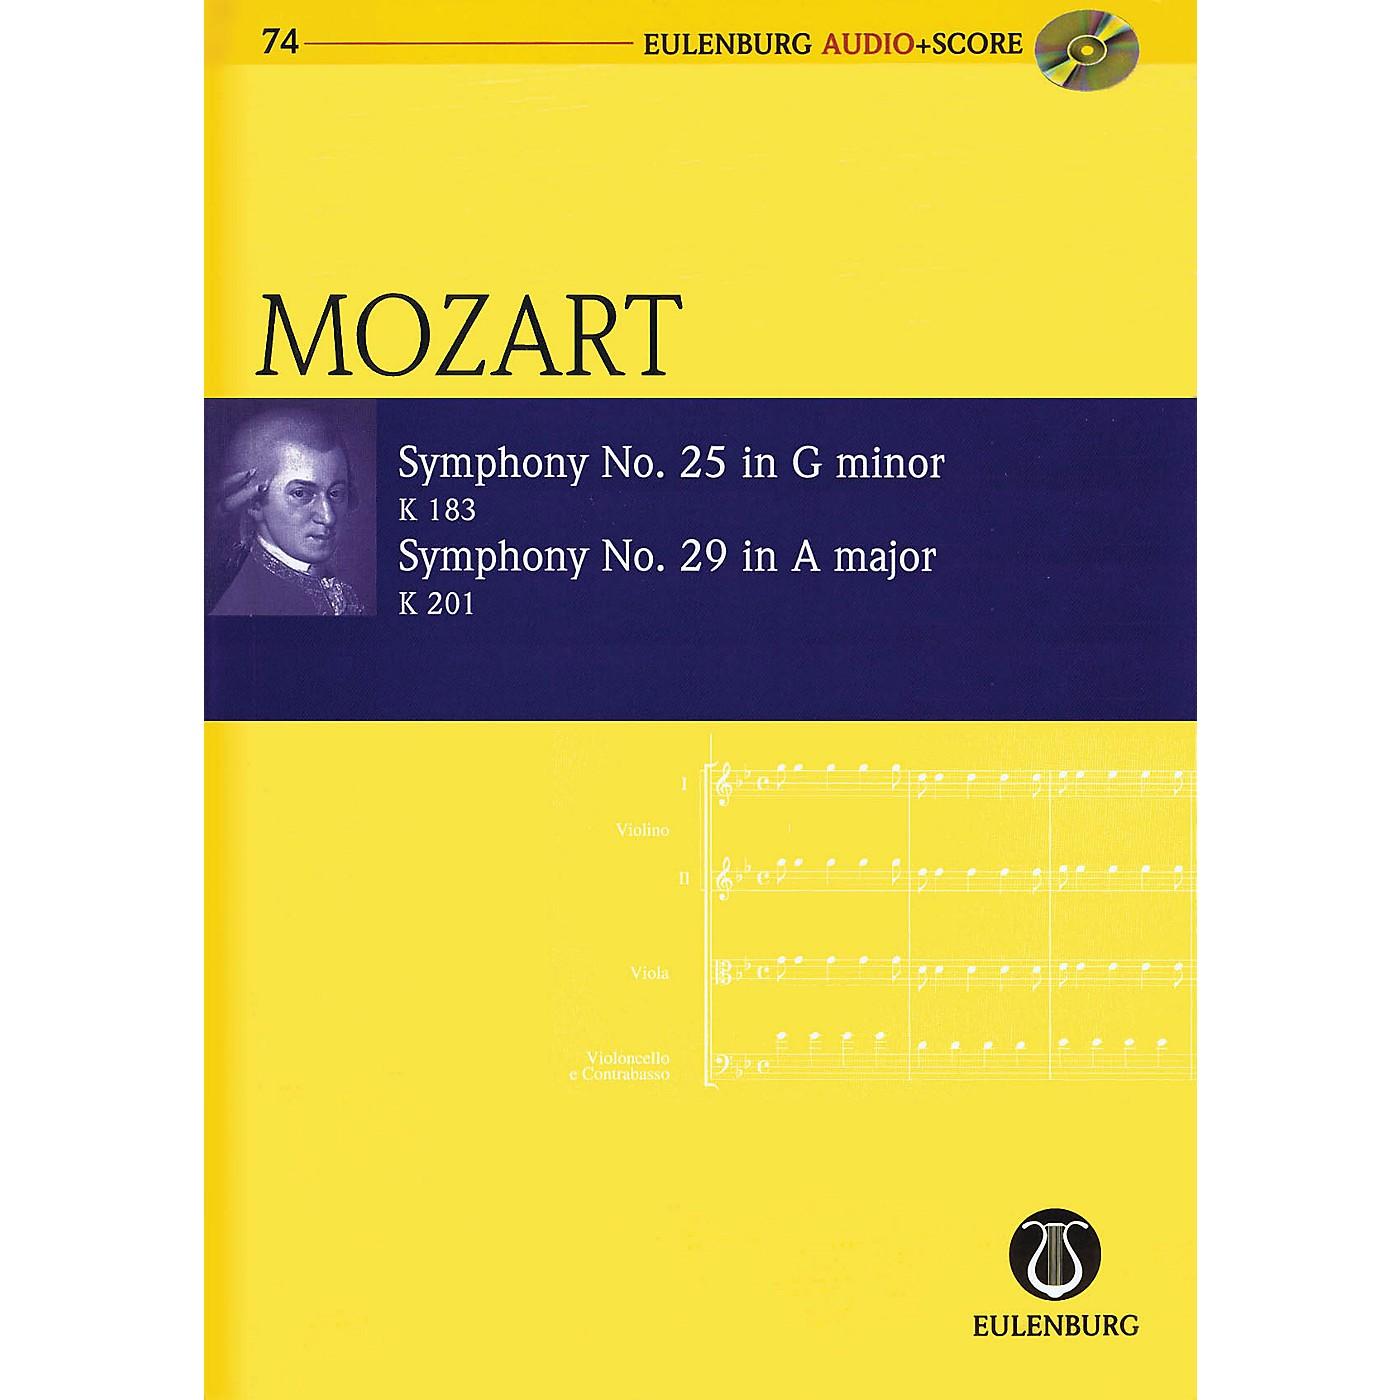 Eulenburg Symphony No. 25 G Minor K183 and Symphony No. 29 A Major K201 Eulenberg Audio plus Score by Mozart thumbnail